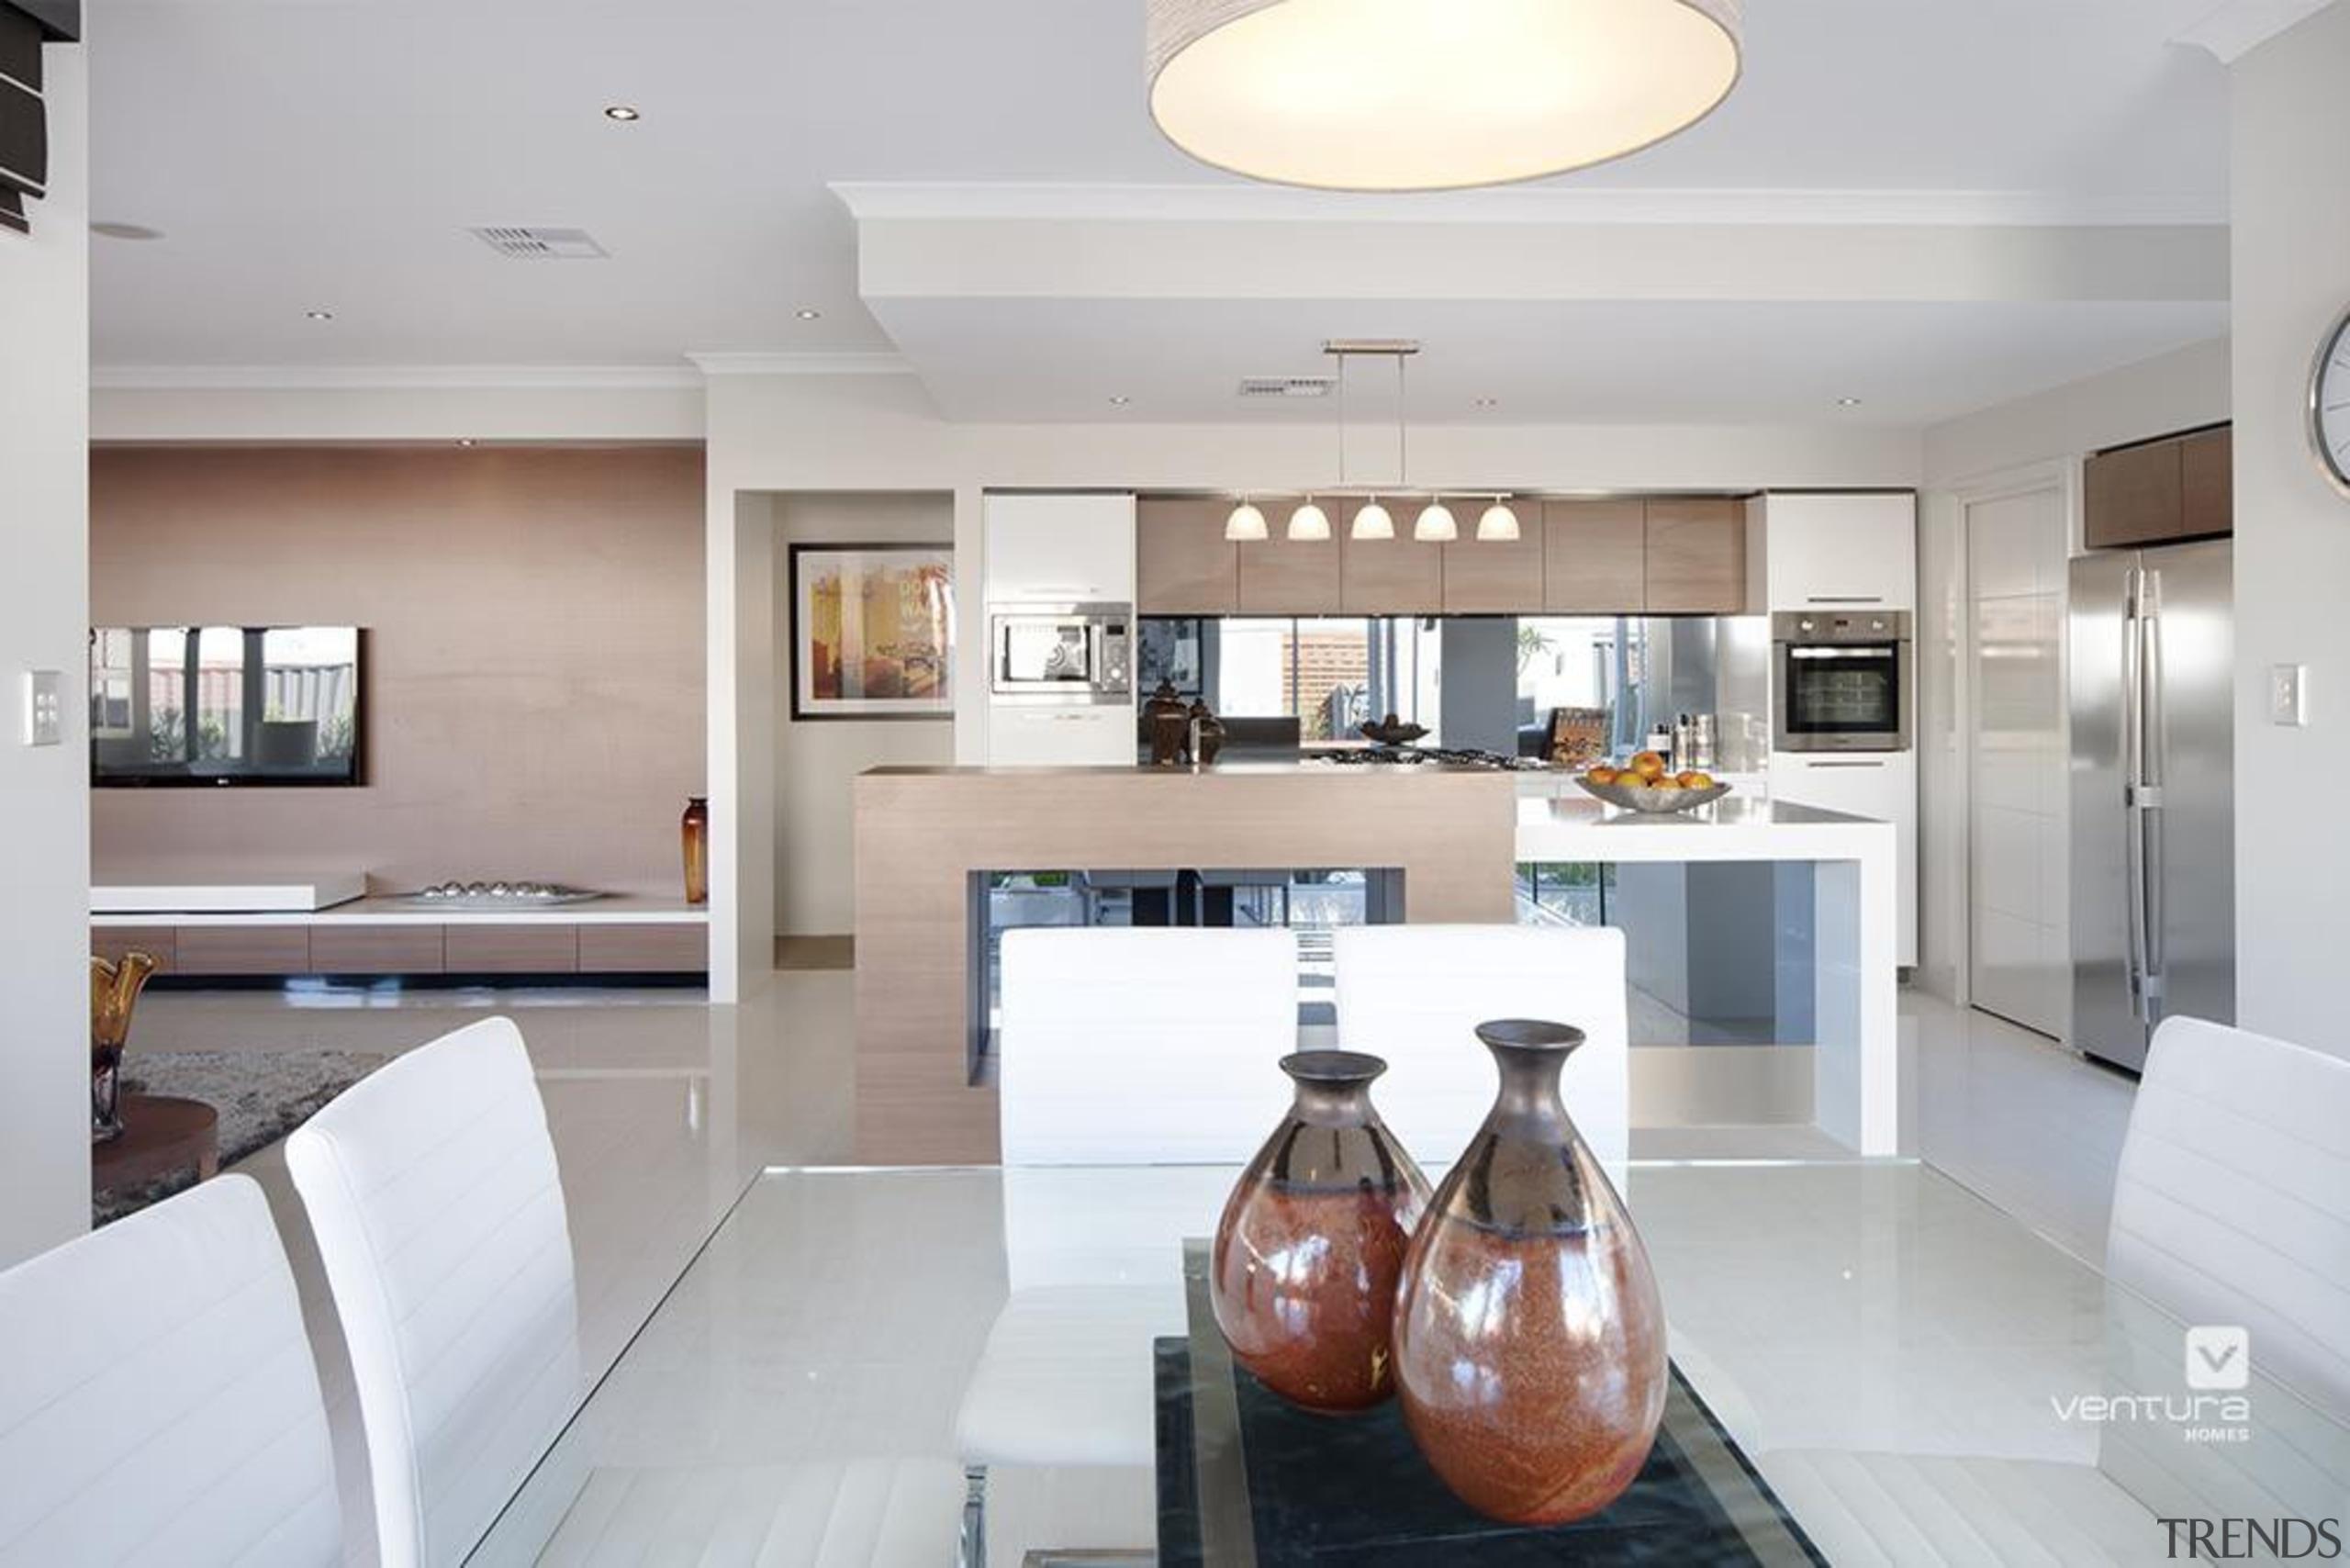 Kitchen design. - The Chianti Display Home - countertop, interior design, kitchen, property, real estate, gray, white